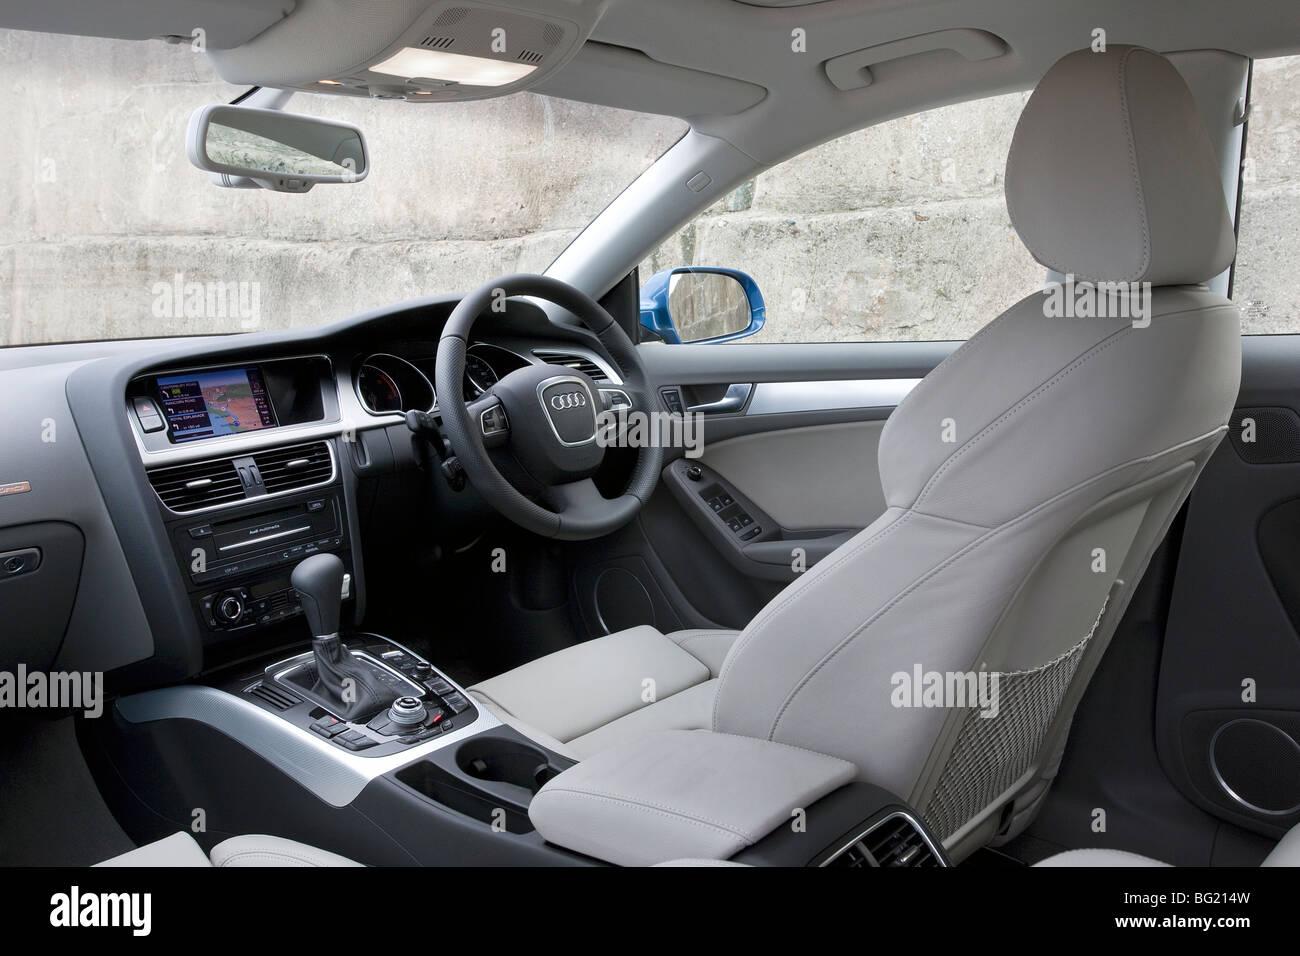 Audi A5 Sportback interior - Stock Image